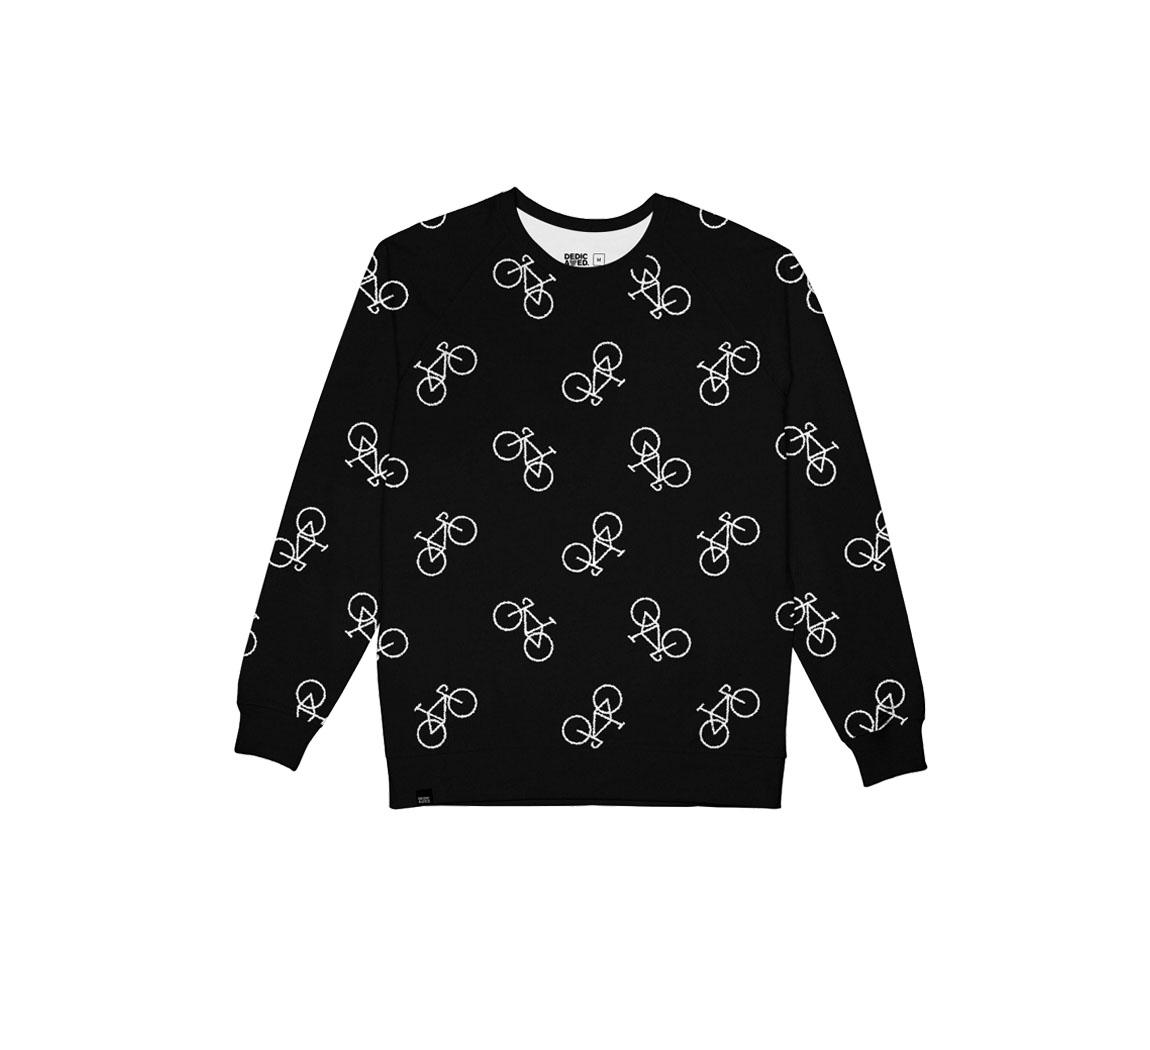 sweat noir velo dedicated promo Mora Knitted Sweatshirts Promo